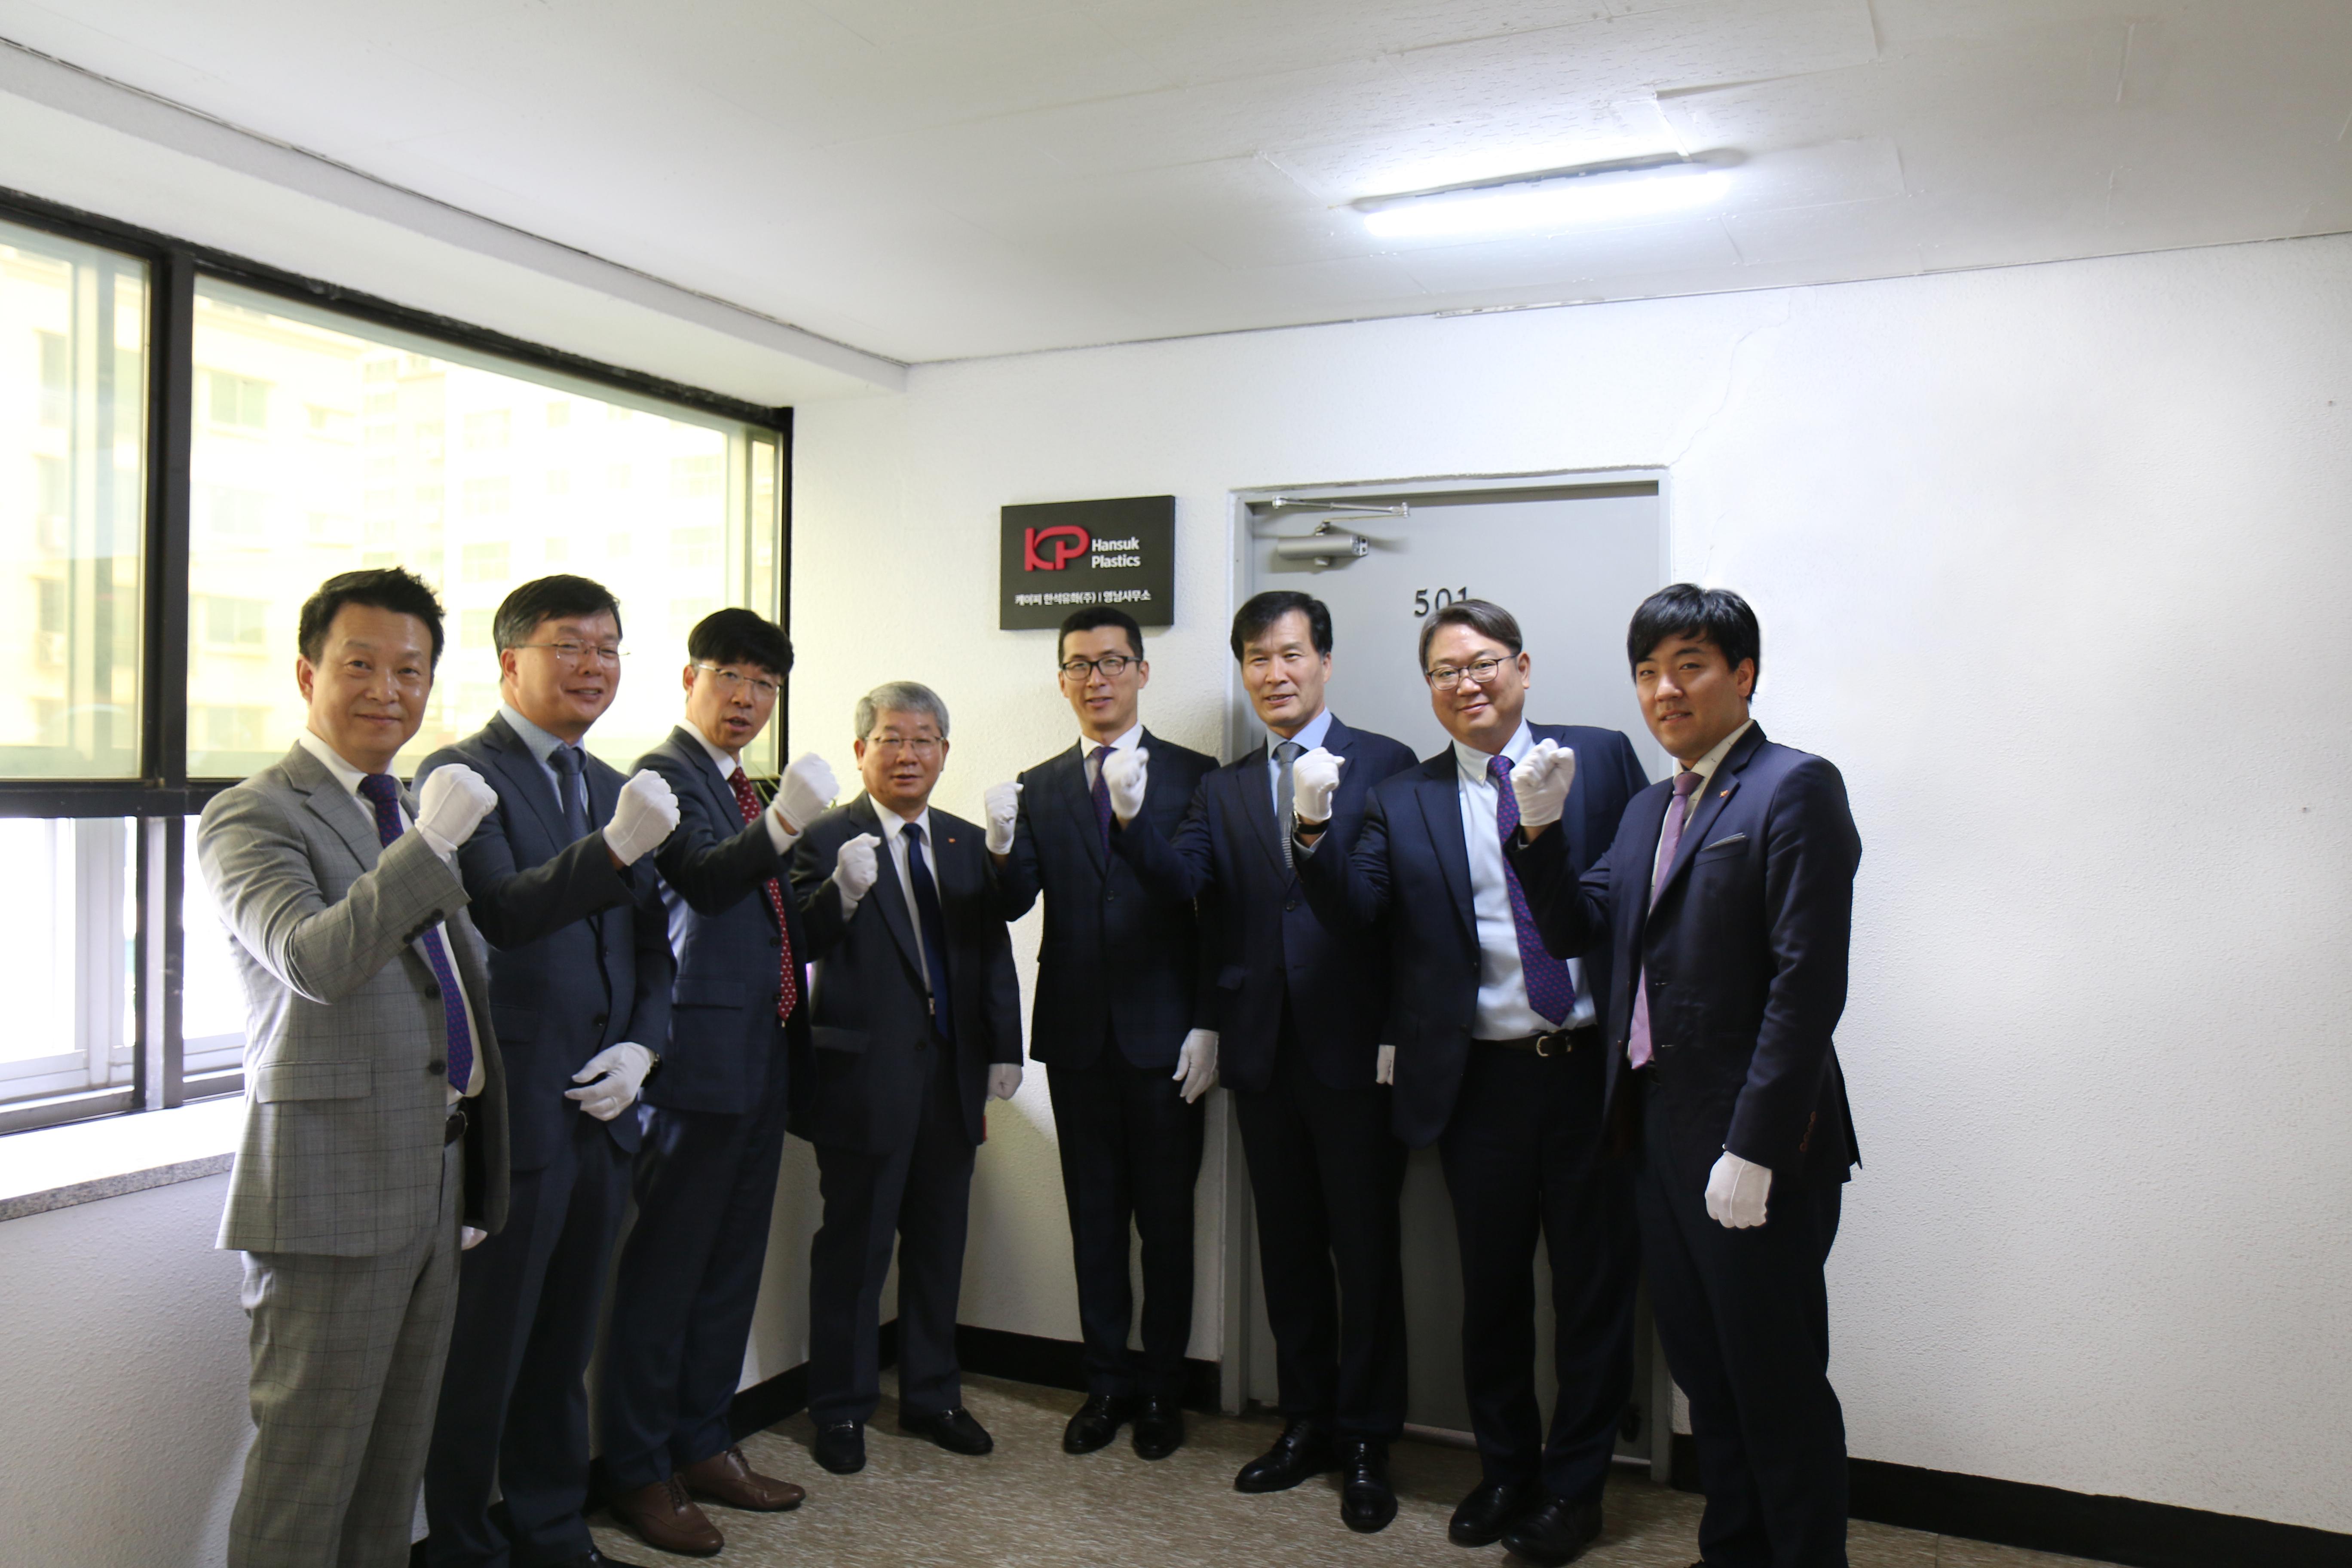 KP그룹 영남사무소 개소식 개최